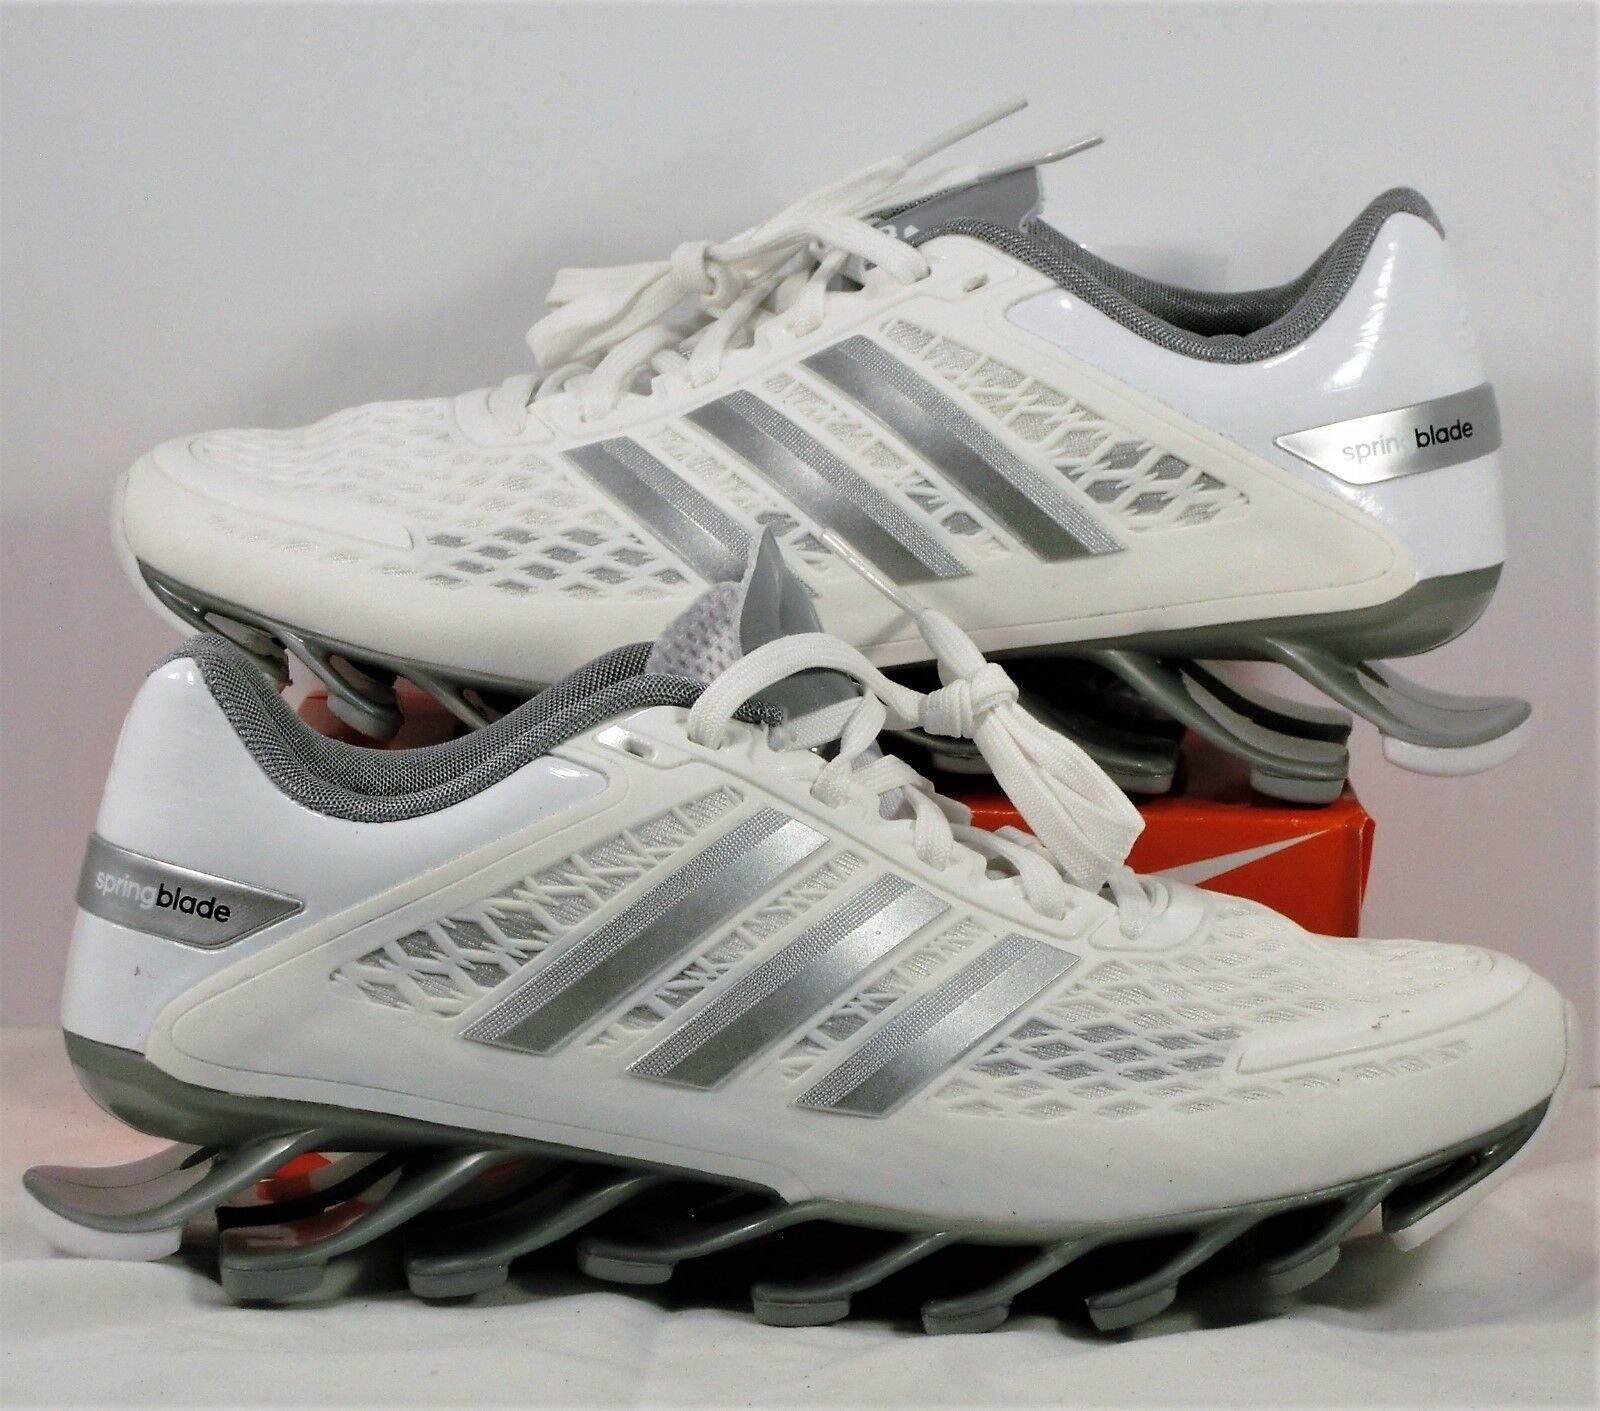 Adidas Springblade Silver Razor White & Grey Silver Springblade Running Shoes Sz 5 NEW M21922 RARE 9e83ae